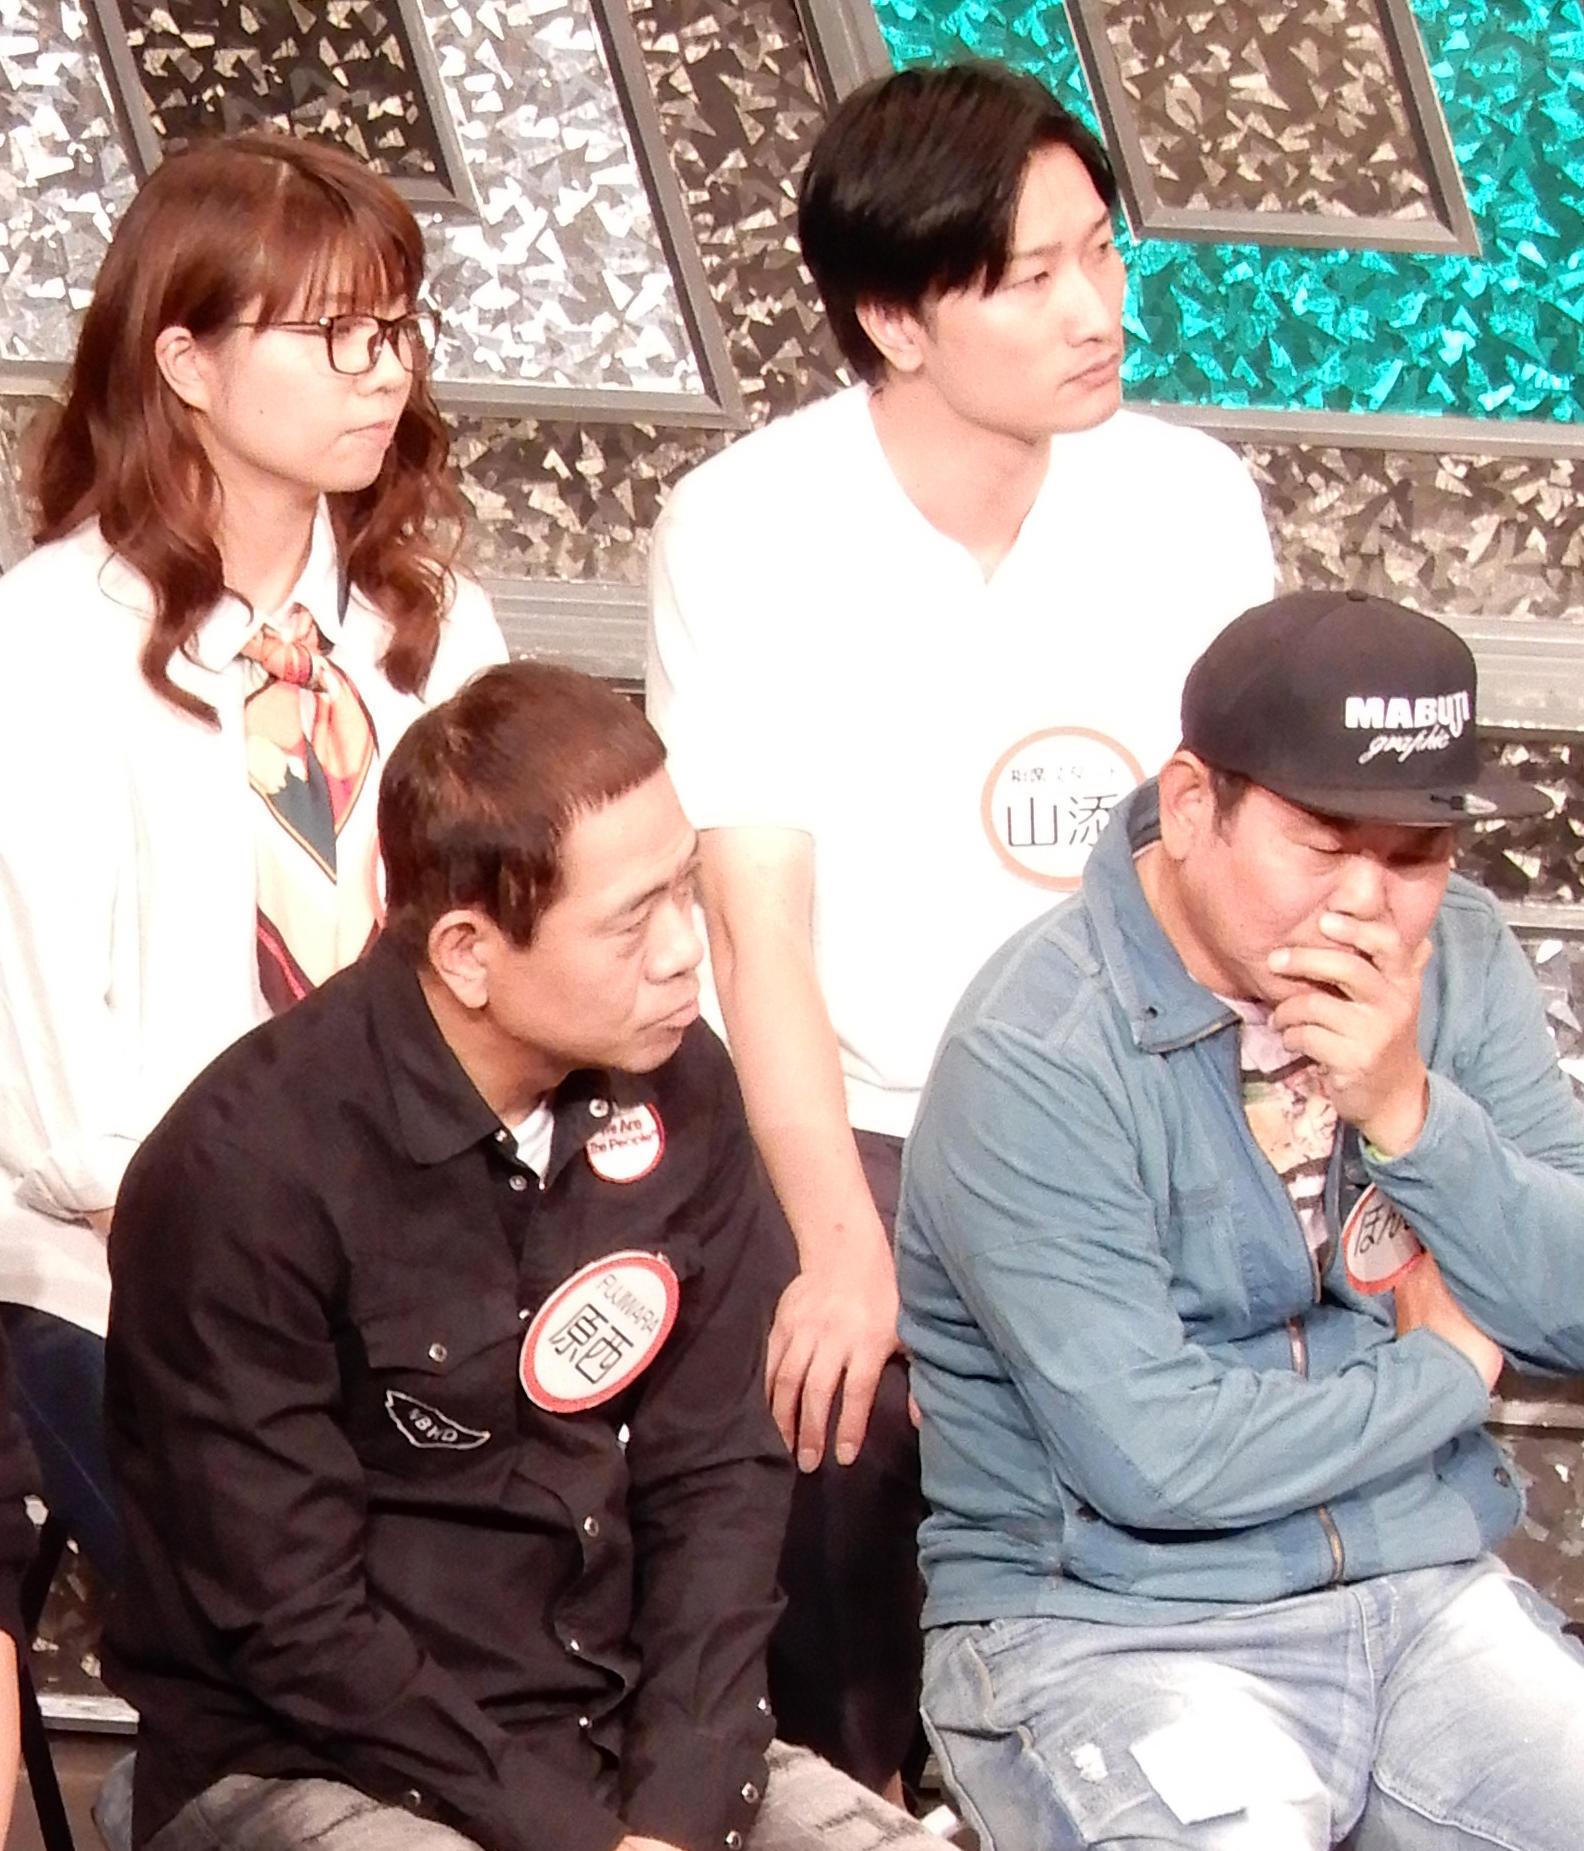 http://news.yoshimoto.co.jp/20181101195801-29de91858b3c4c236d86577d7ce9e27c6c3624c4.jpg